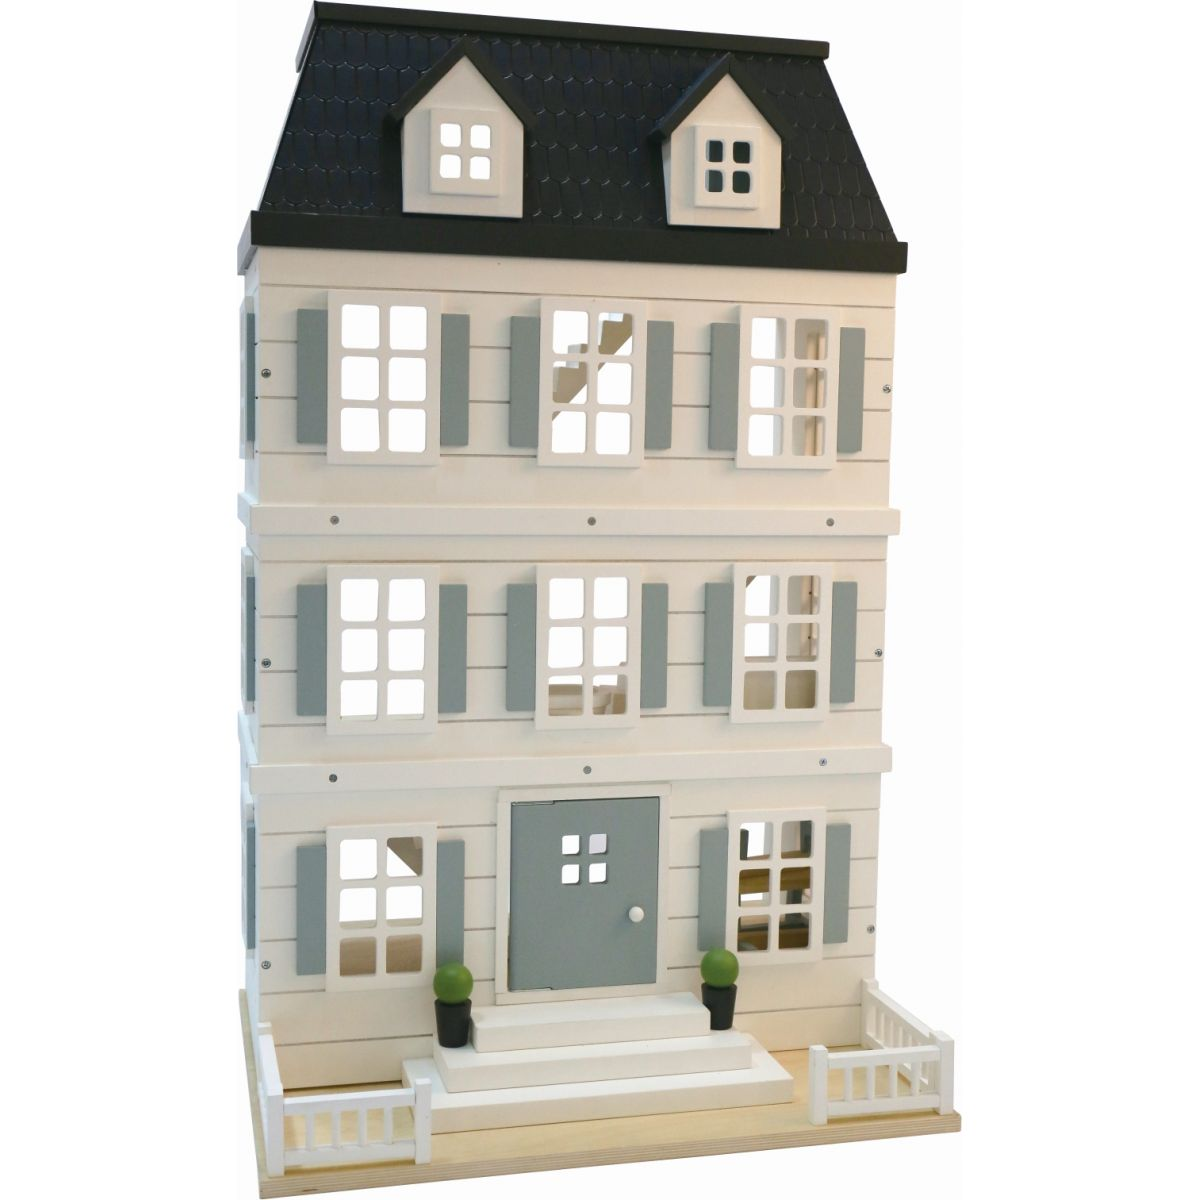 EverEarth Doll House(エバーアース ドールハウス)